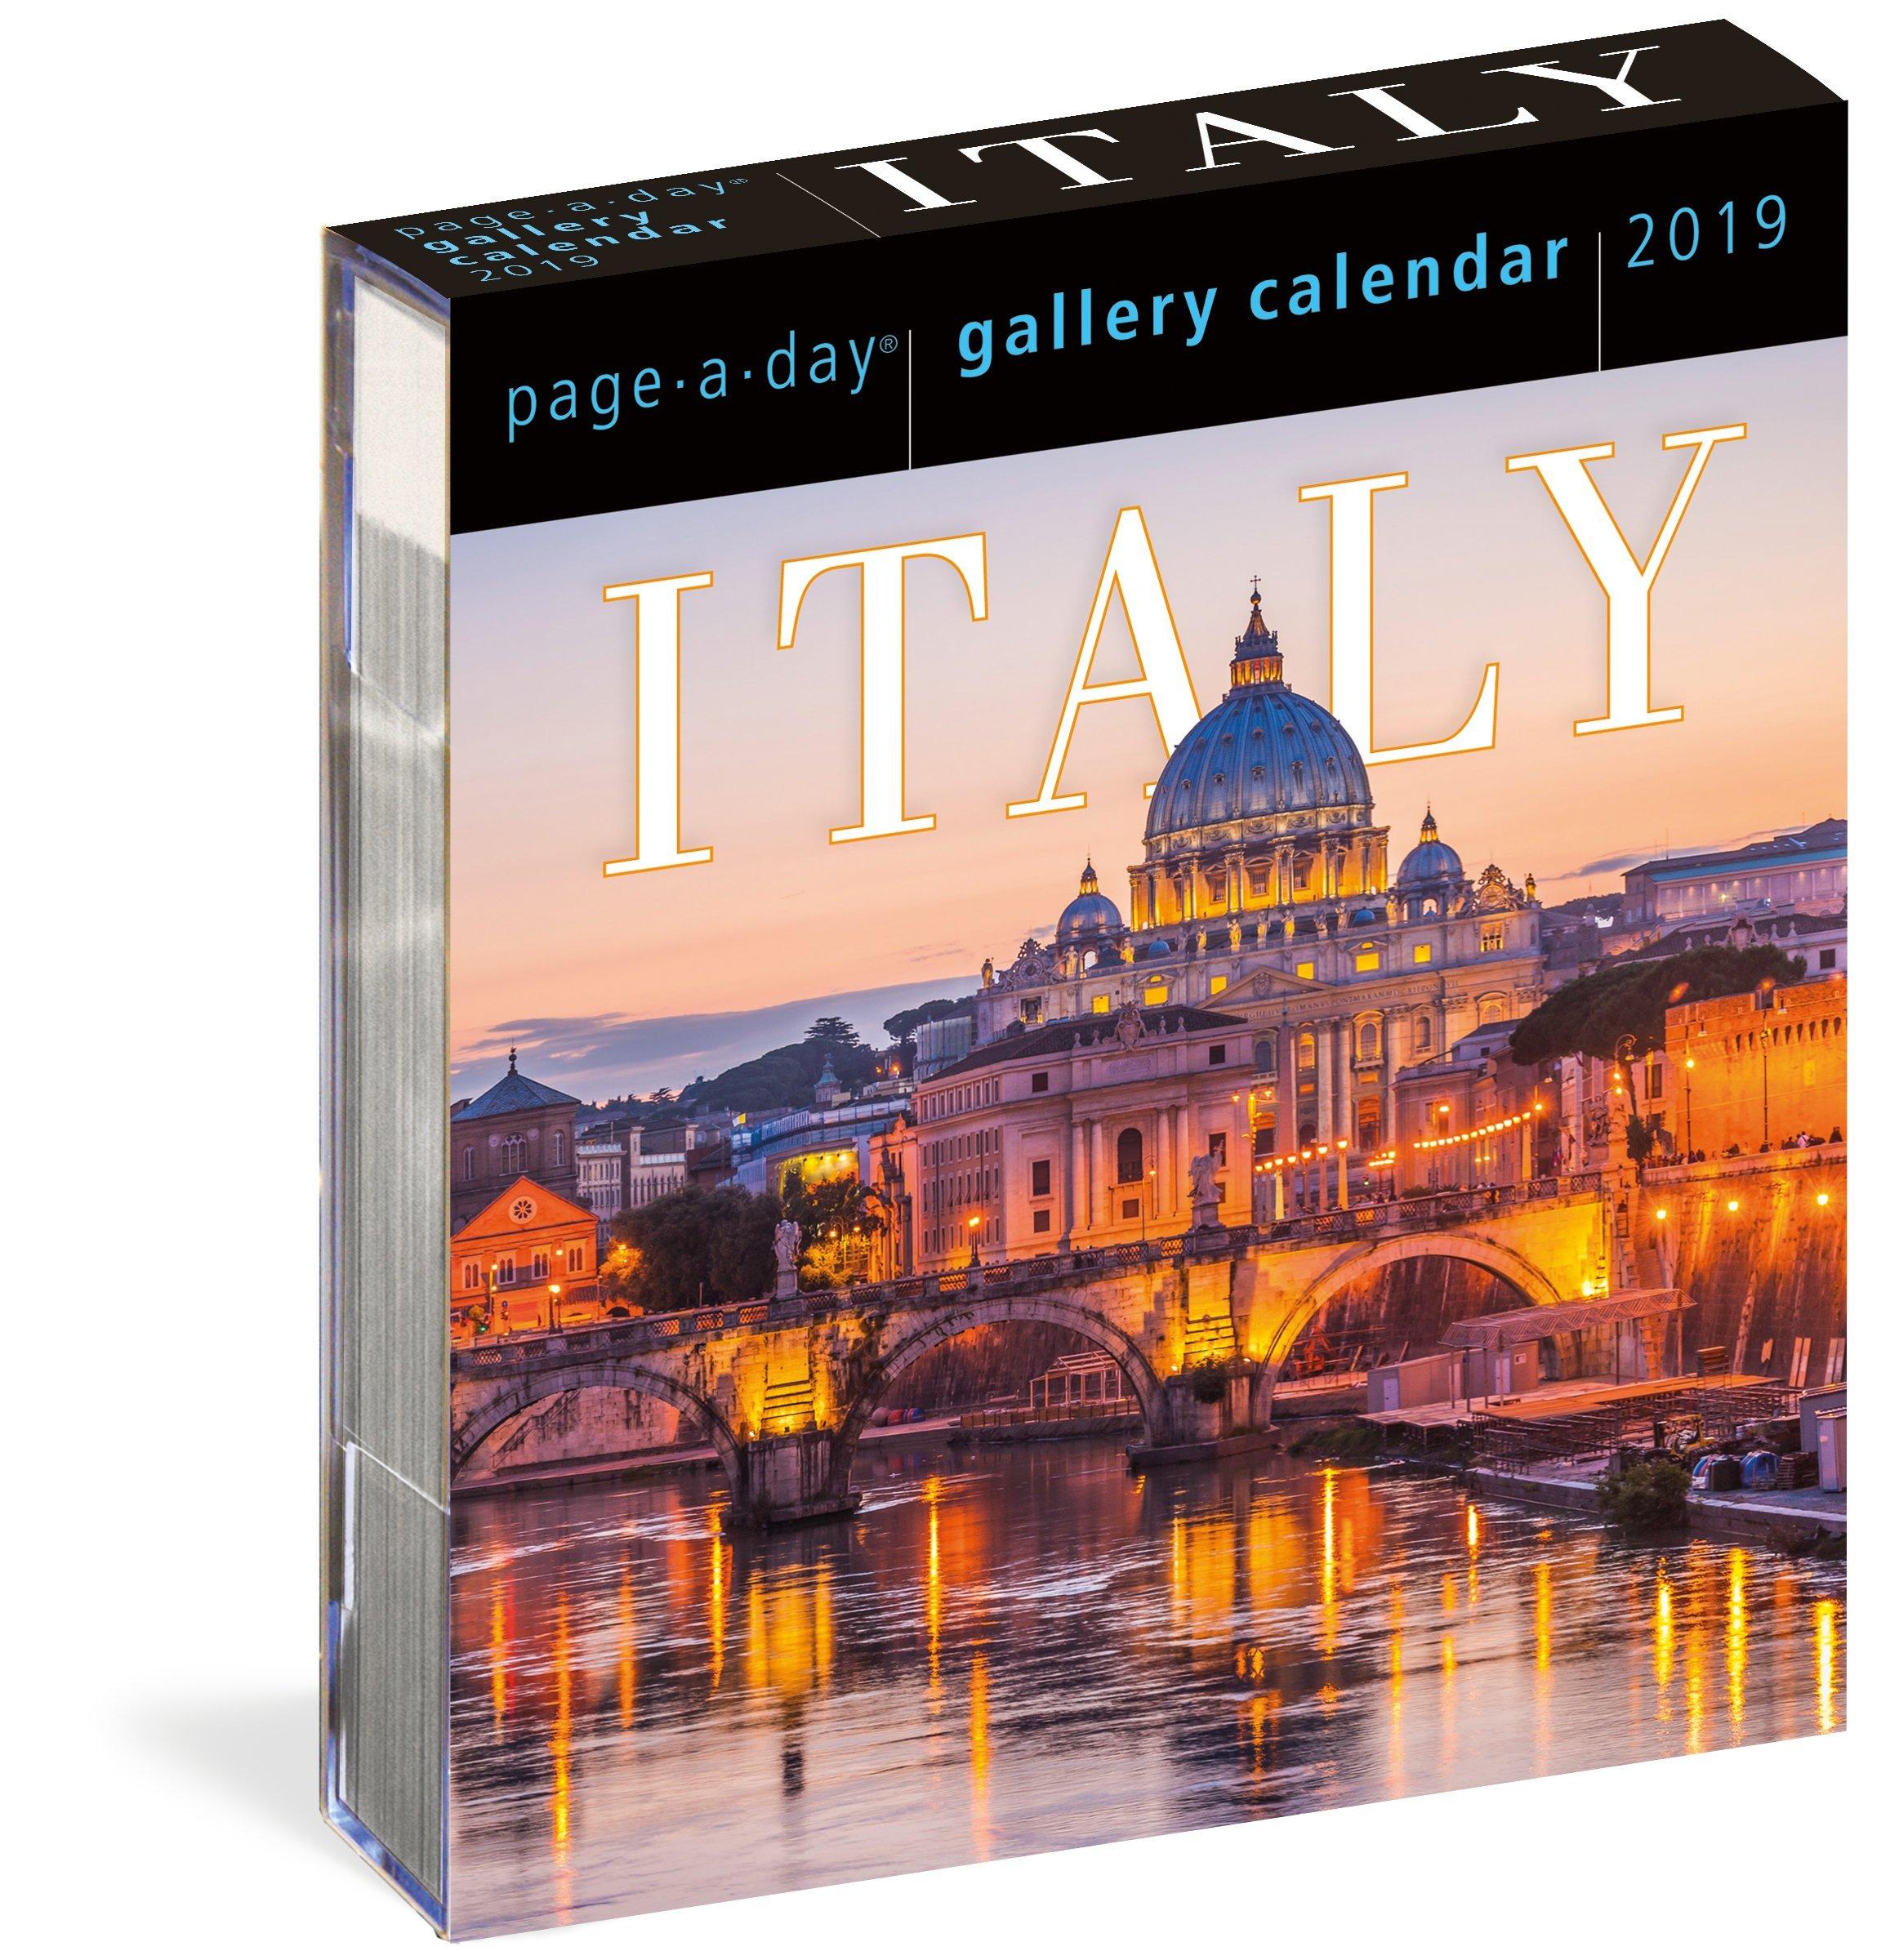 italy page a day gallery calendar 2019 ebook